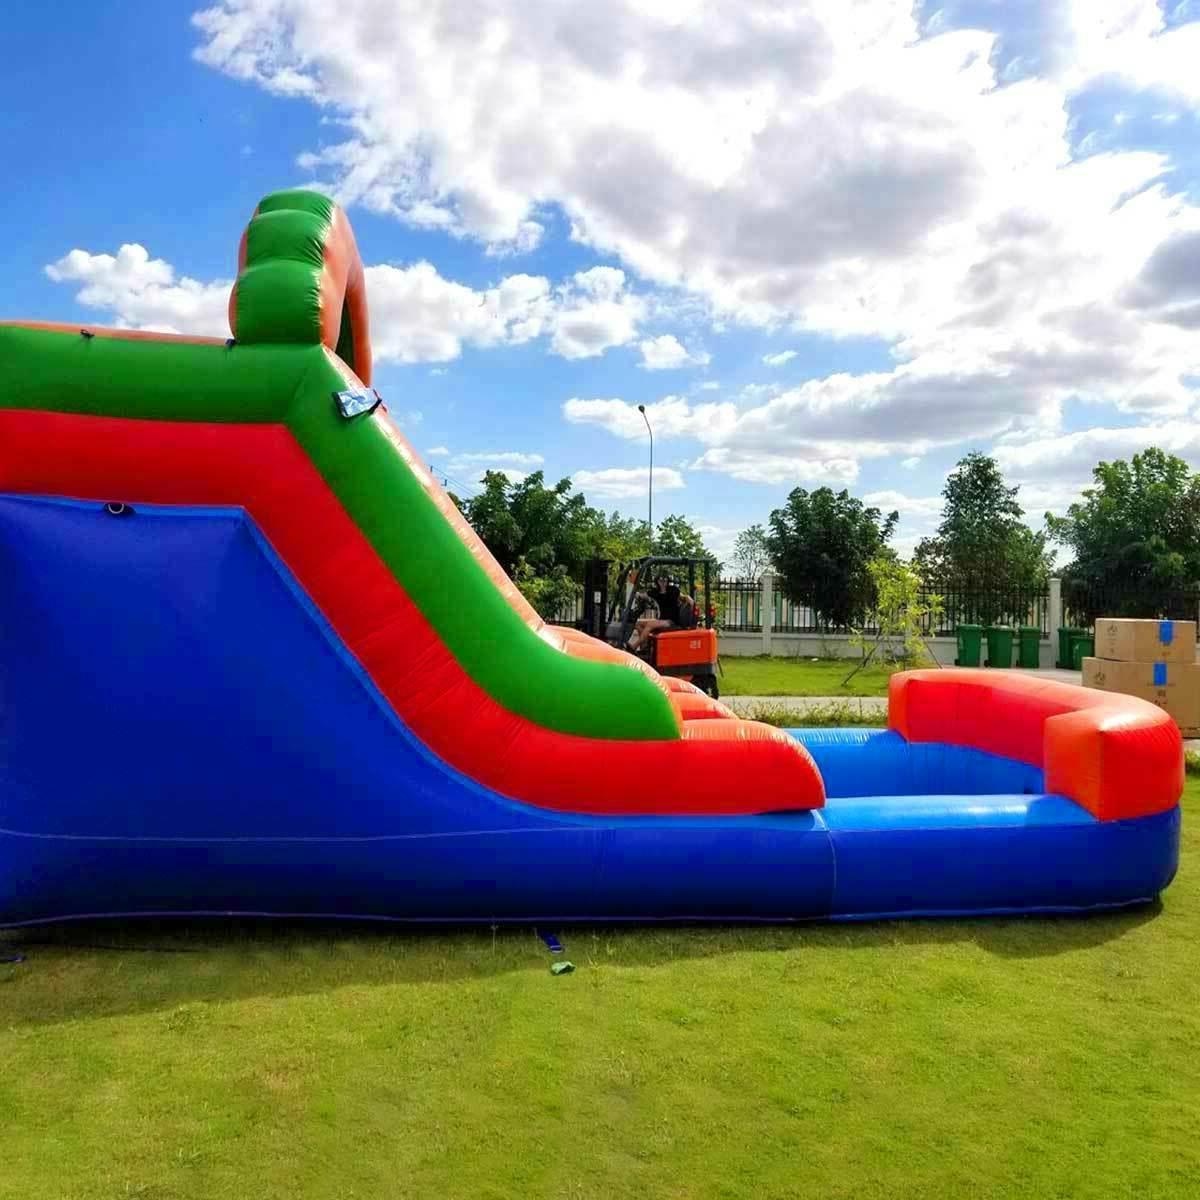 Rainbow Inflatable Slide Single Wet Slide W/ Blower